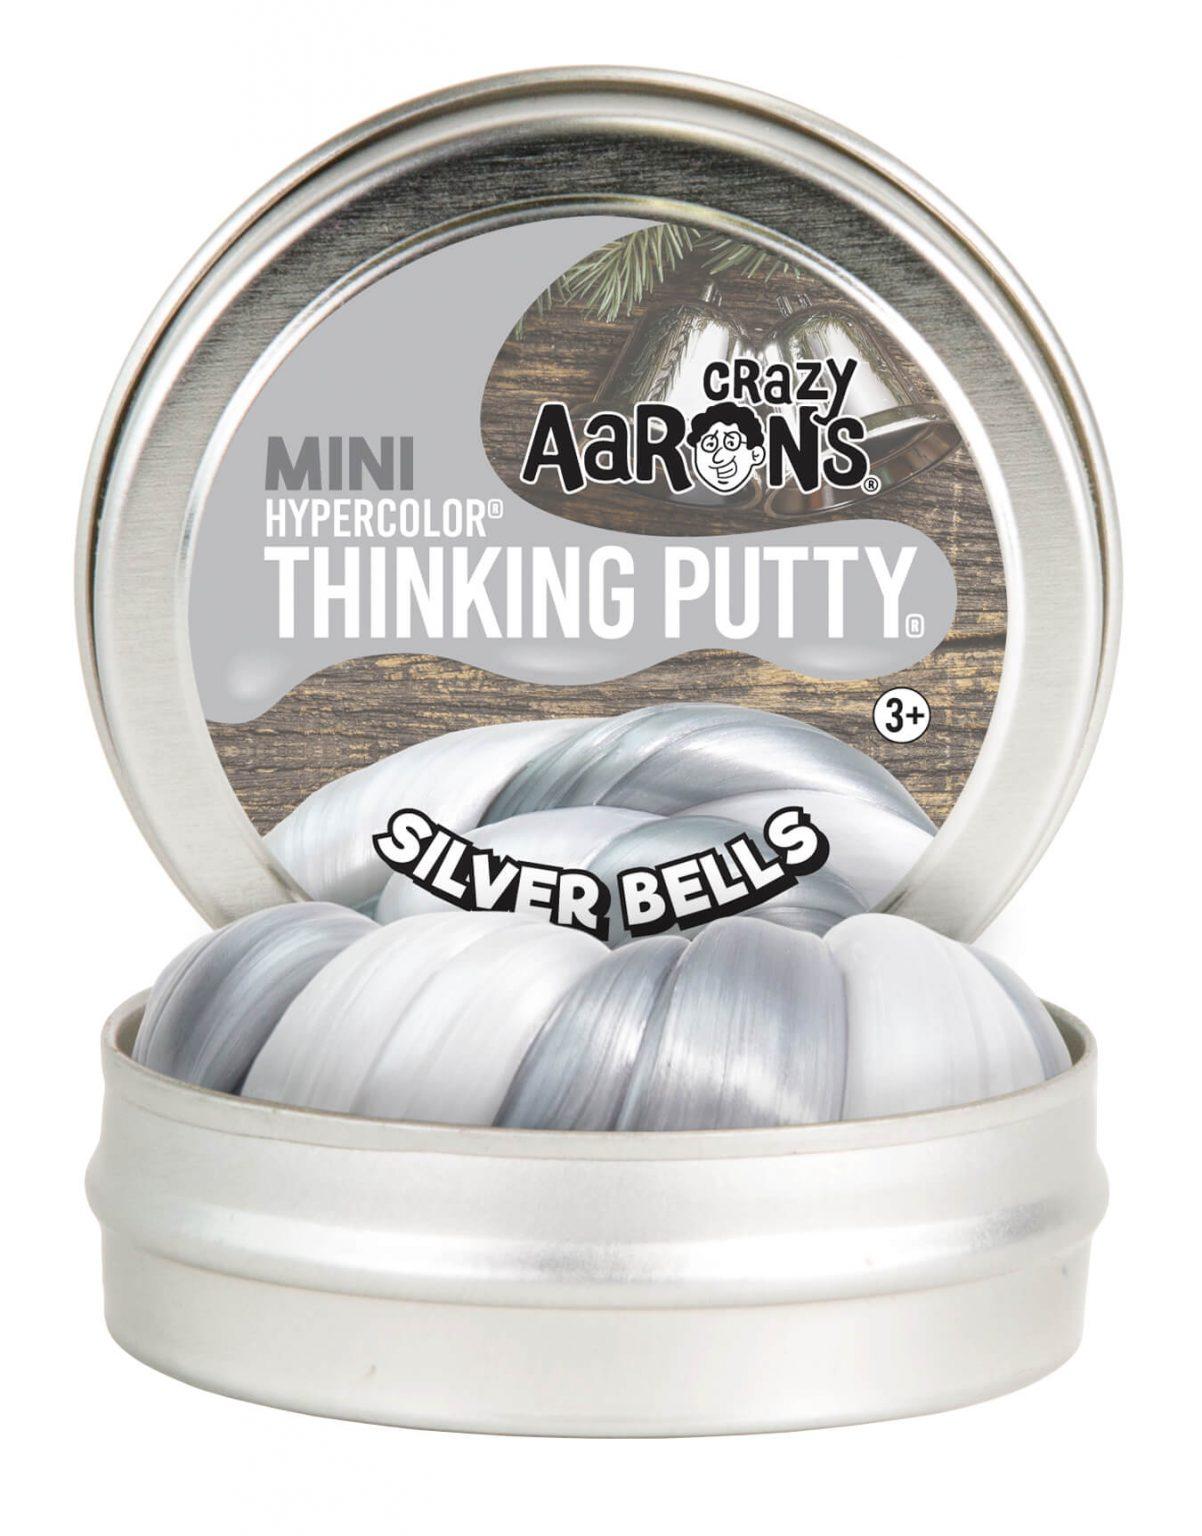 Crazy Aarons Putty Silver Bells 5 cm